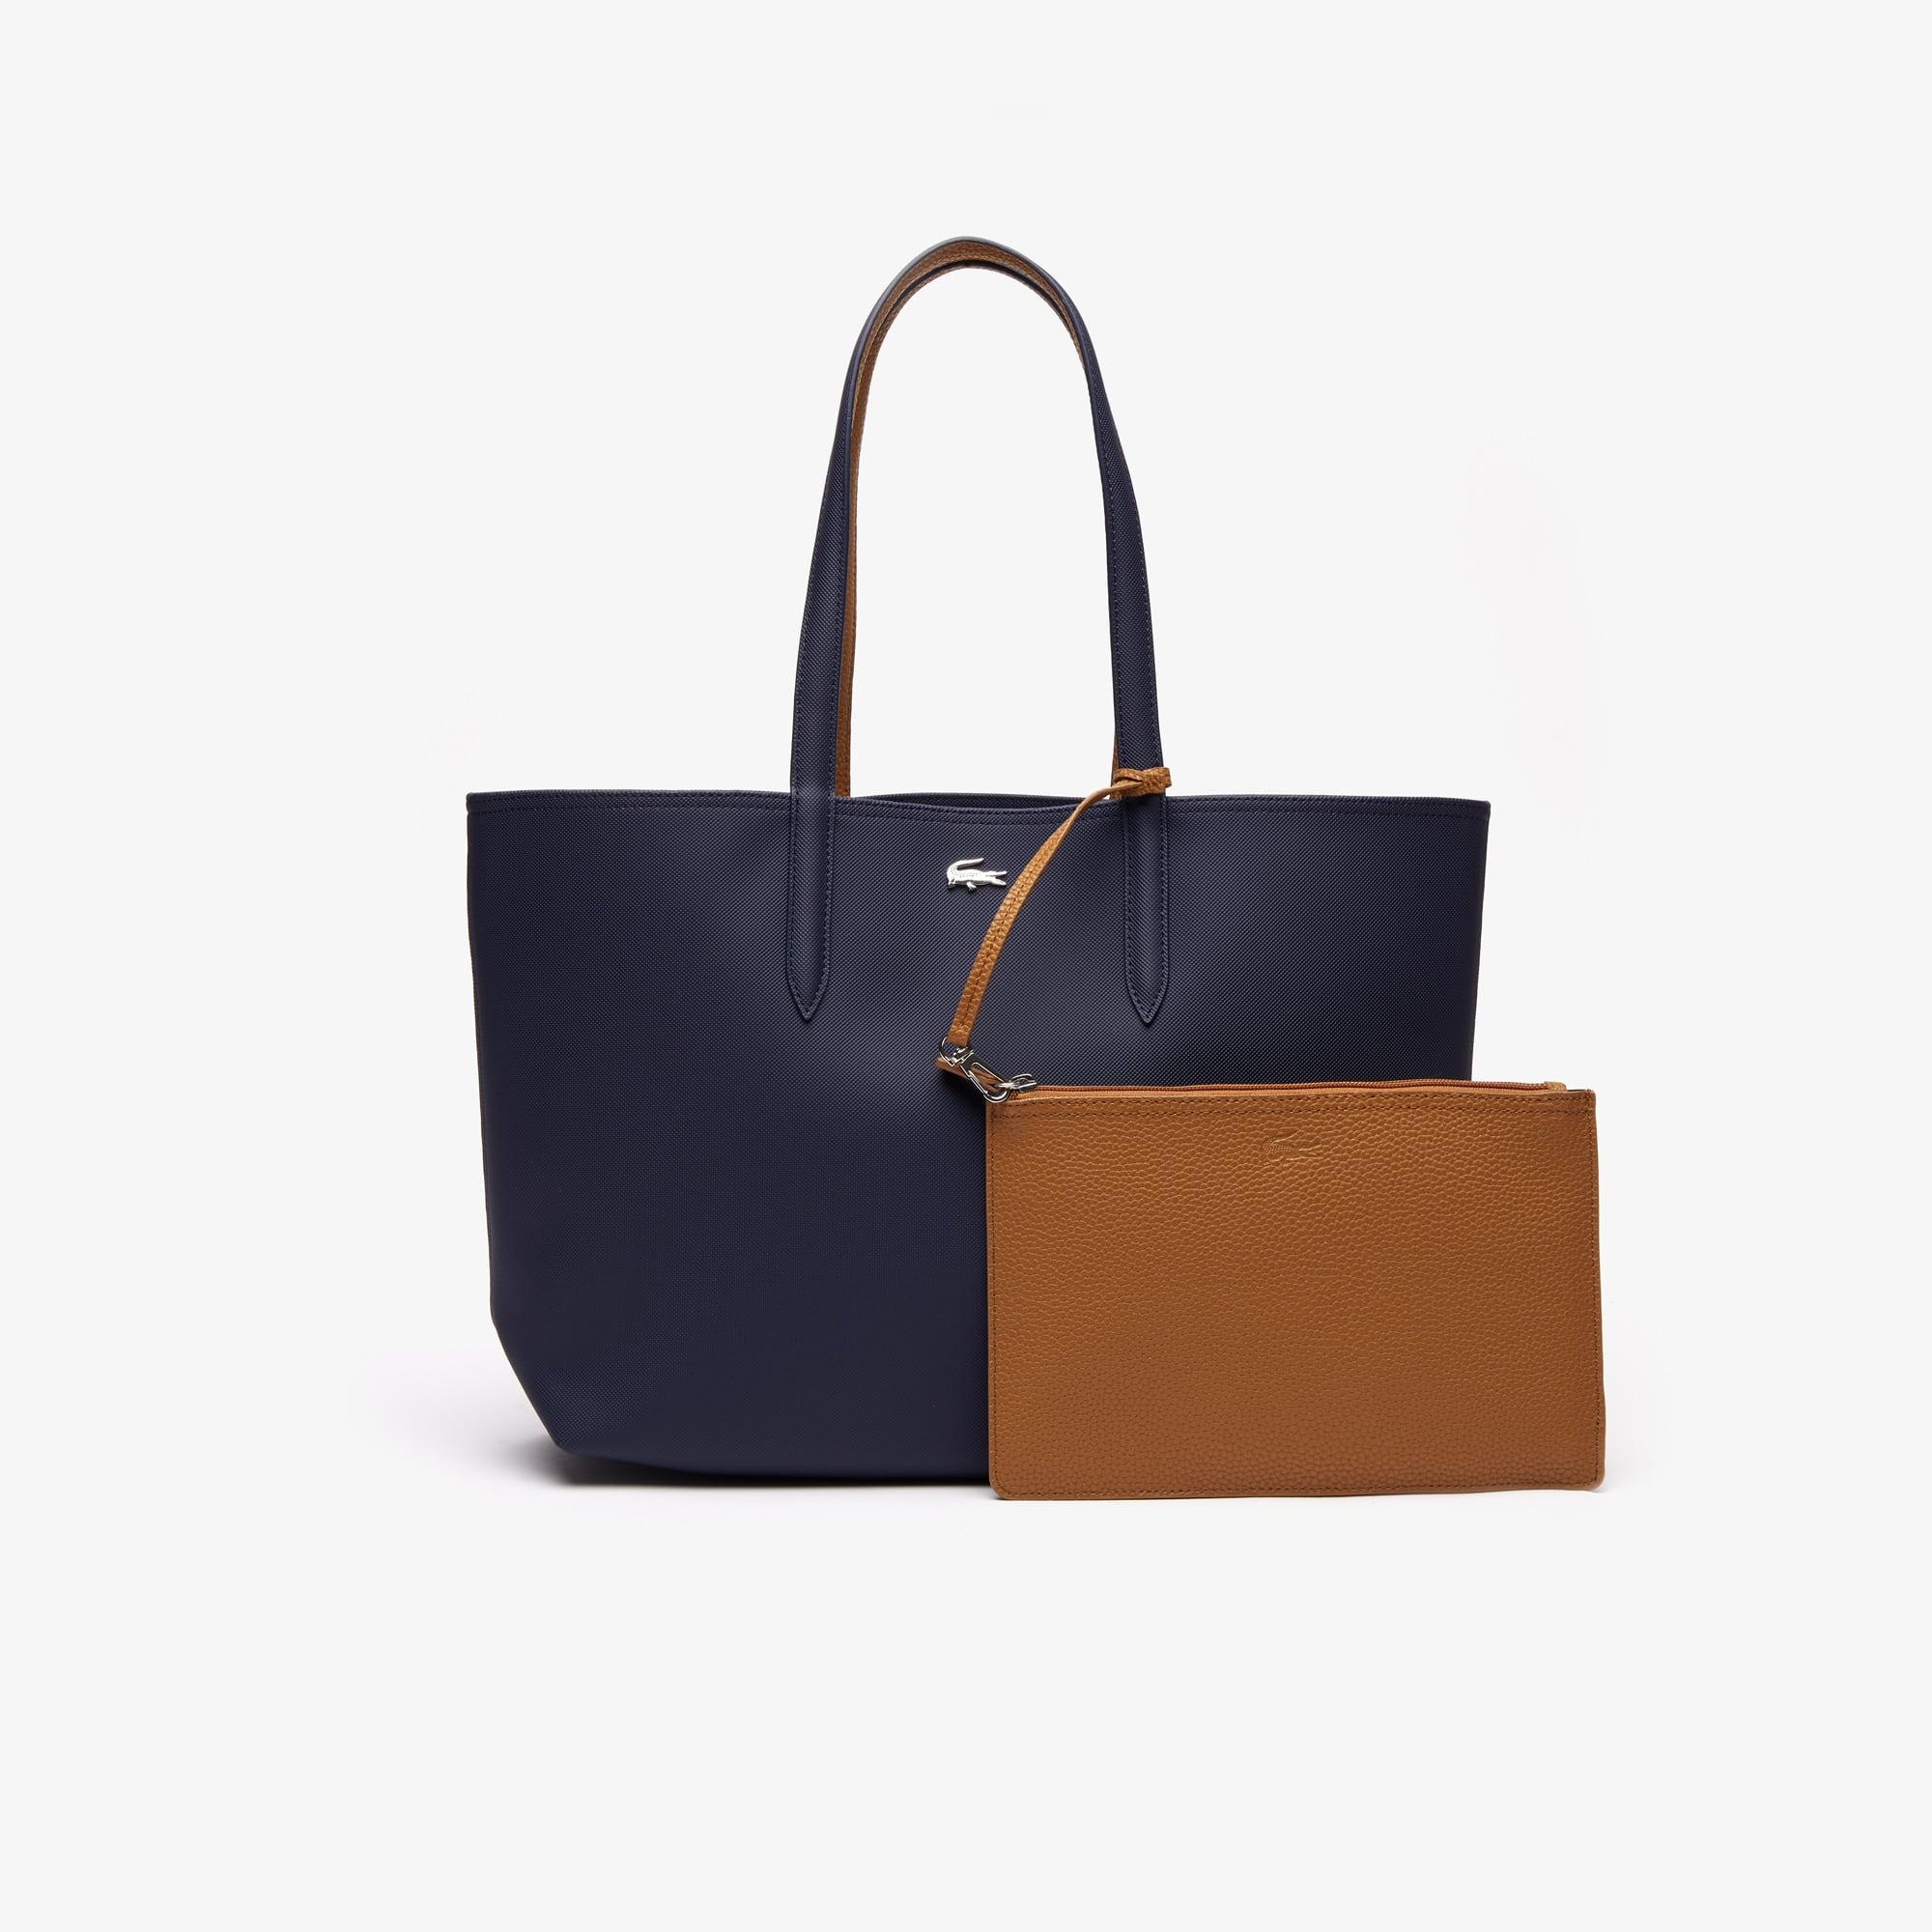 5fcaef299f Sacs à main cuir, sacs cabas | Maroquinerie femme | LACOSTE